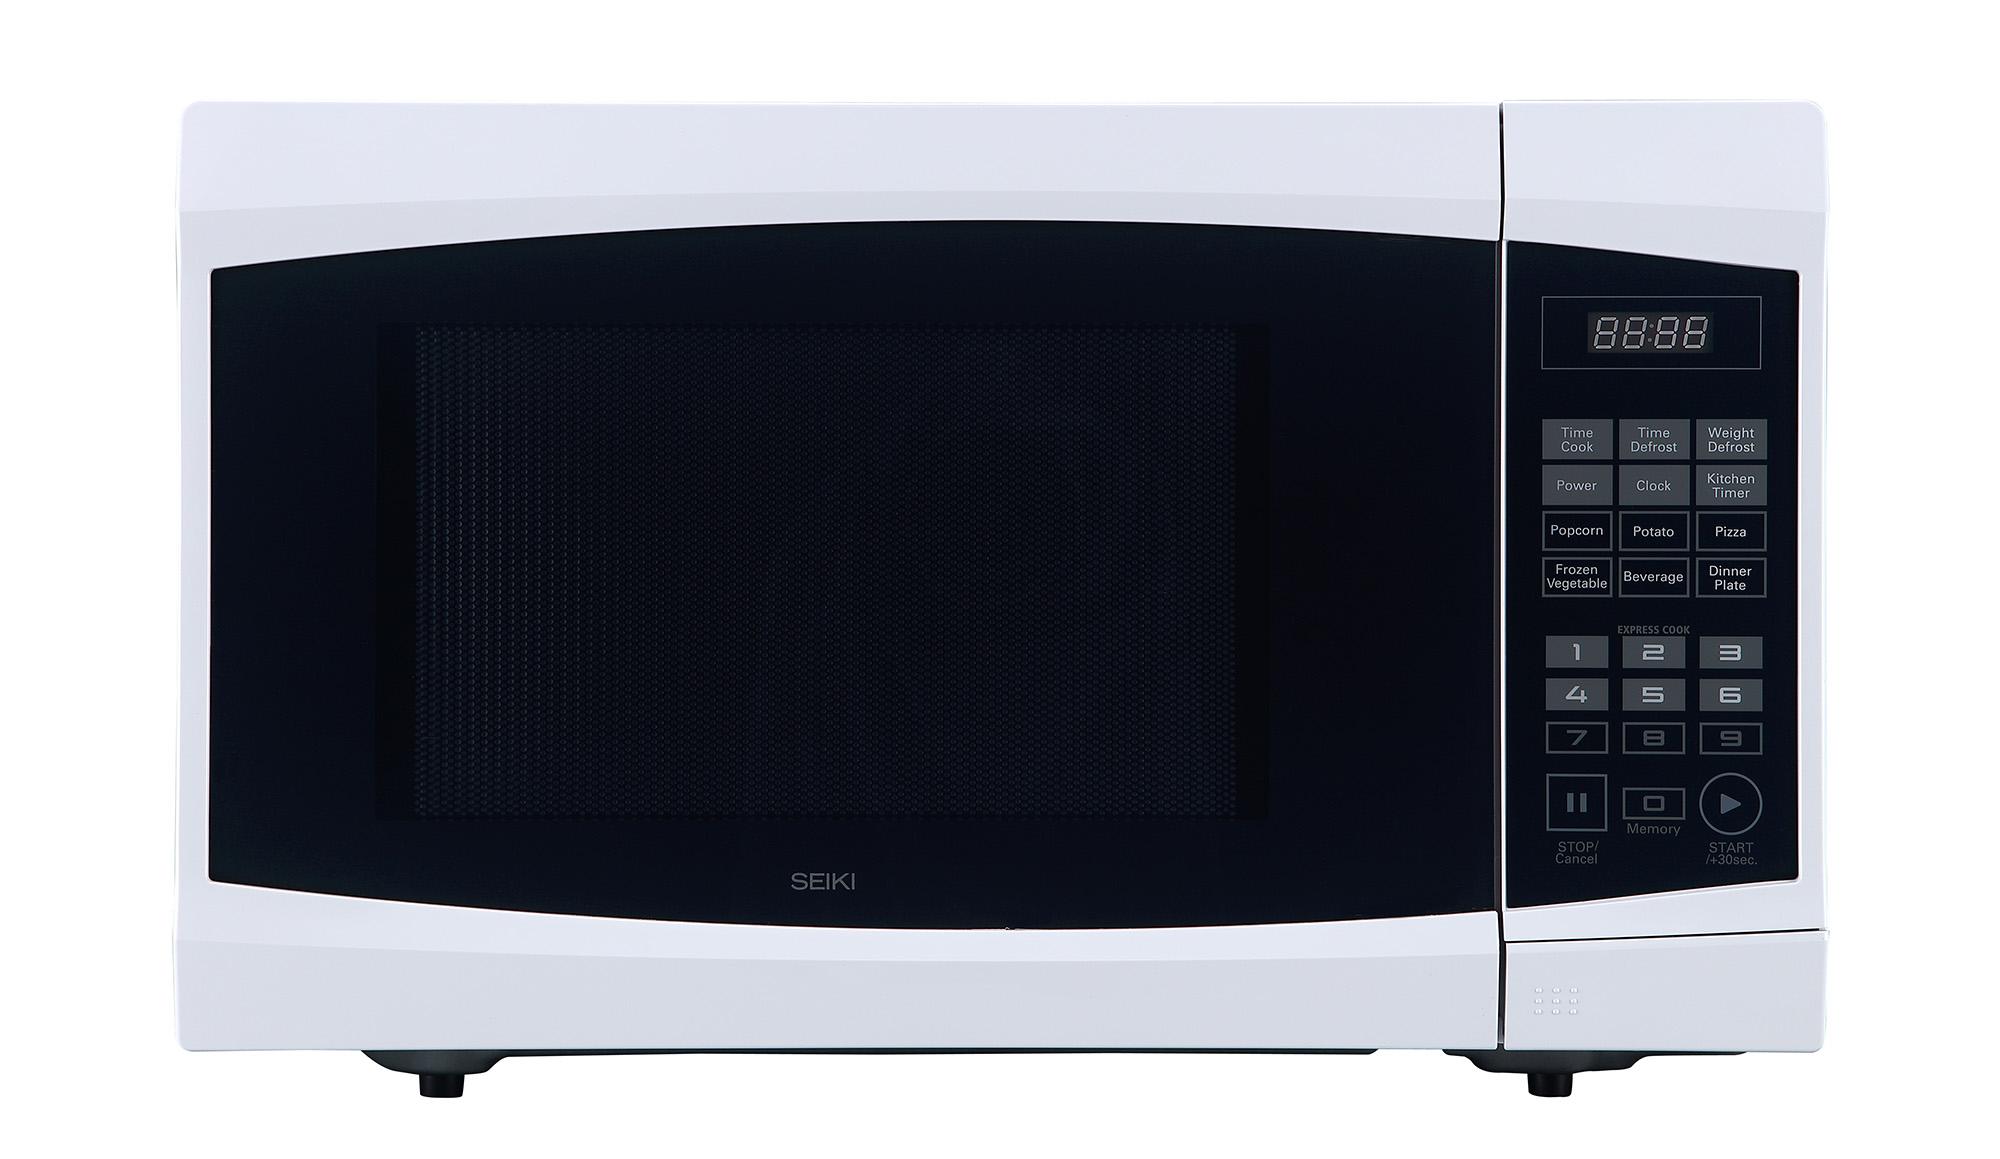 SC-3000MV - 2